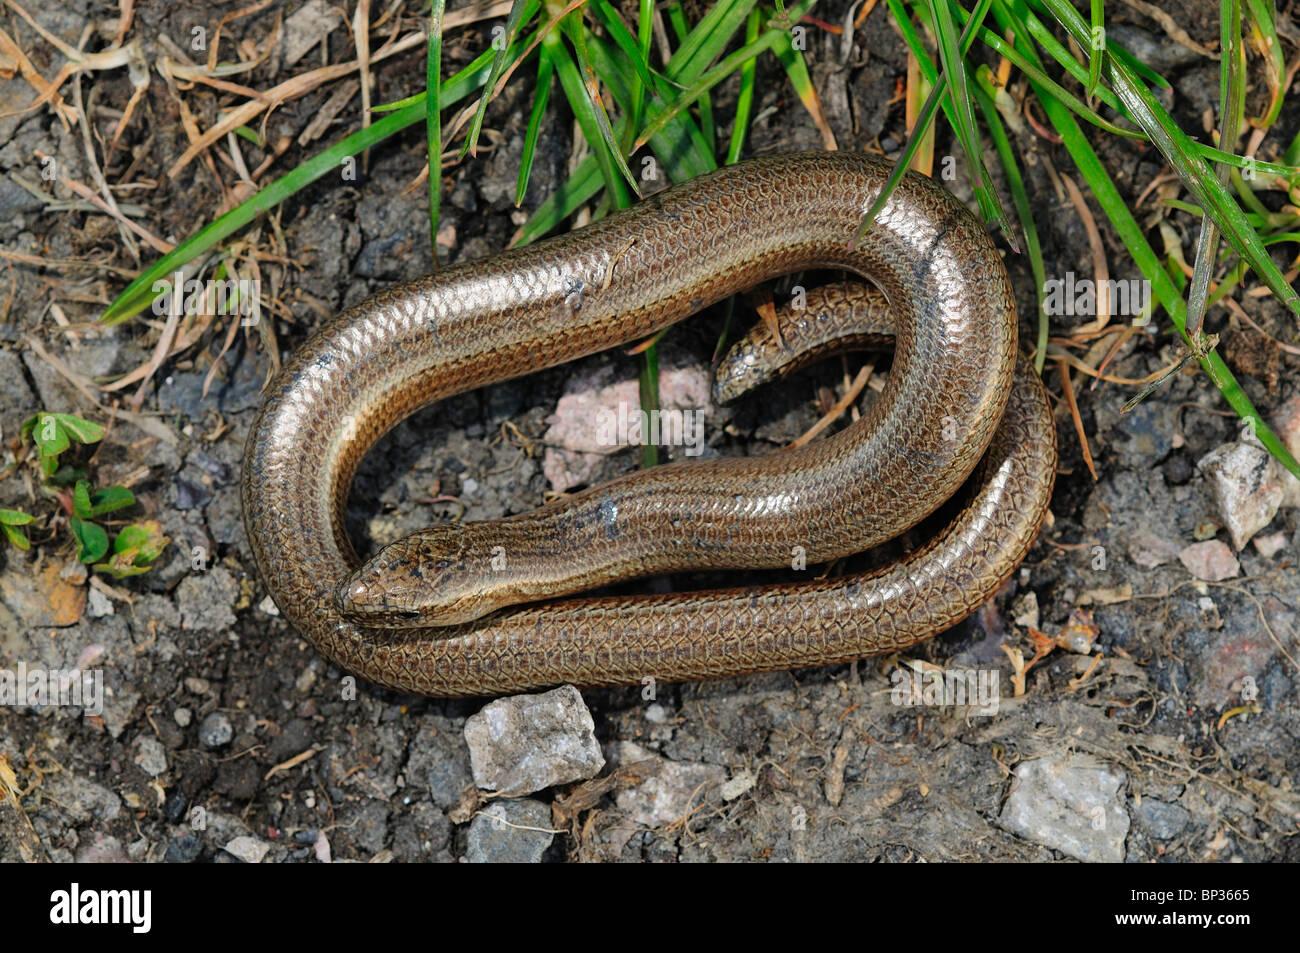 Slow-worm at rest. Dorset, UK April 2010 Stock Photo